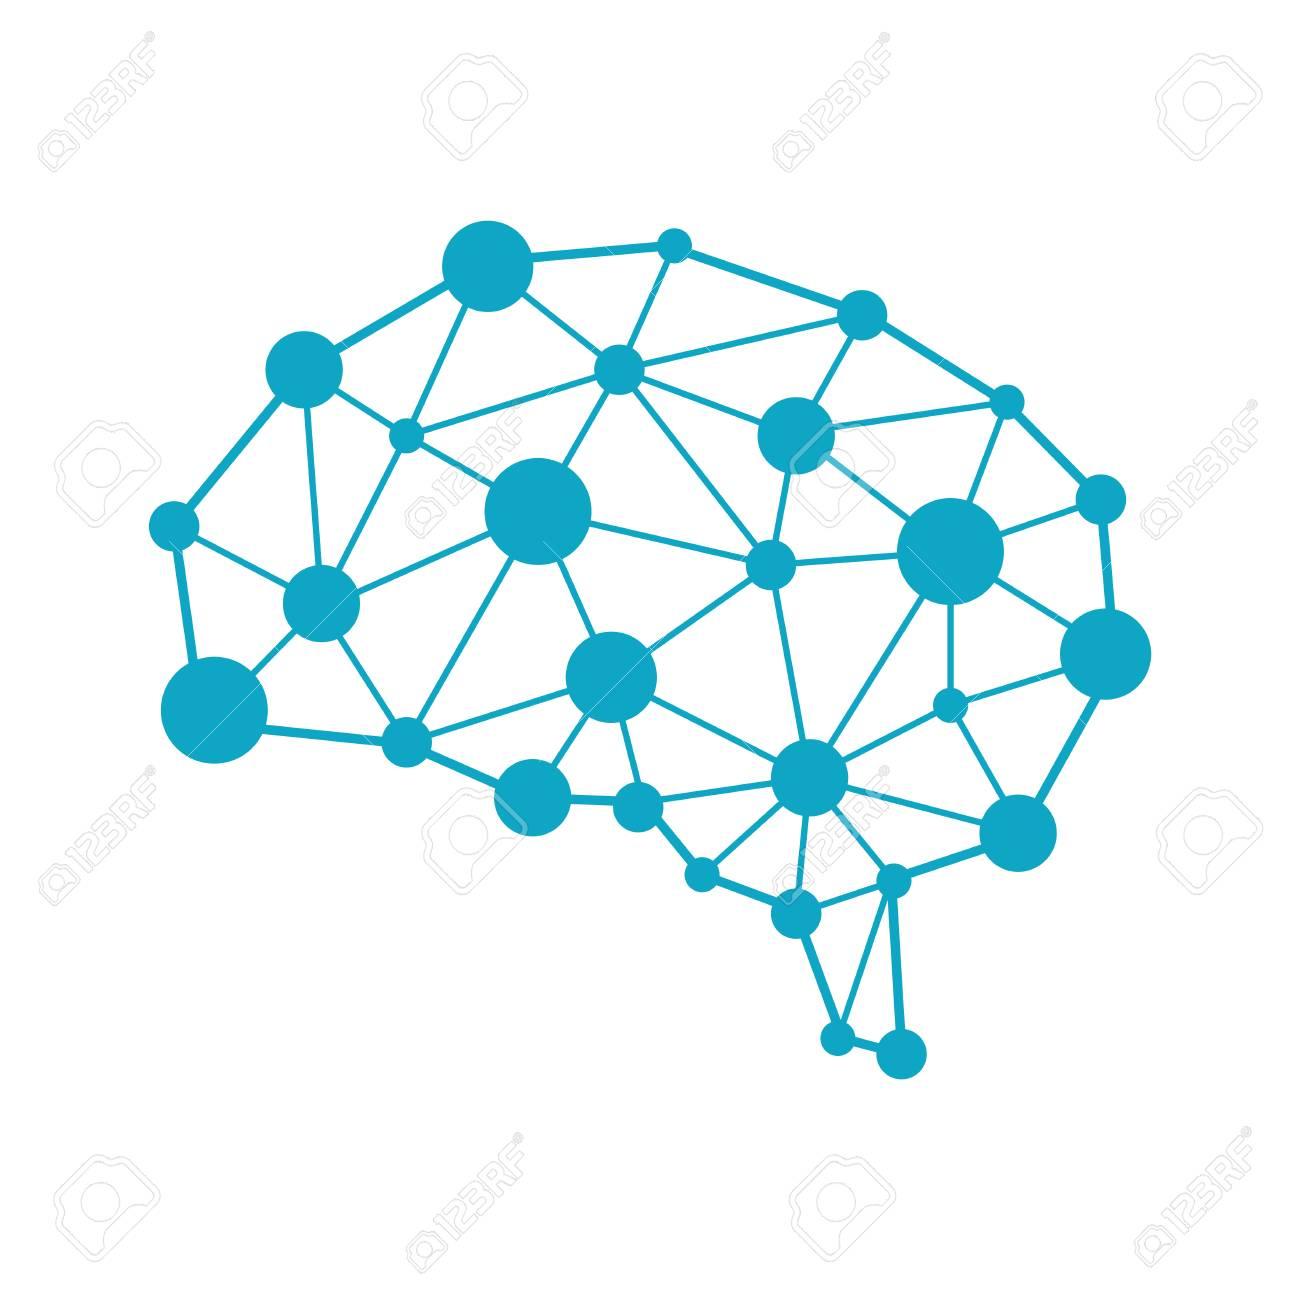 AI (artificial intelligence) image illustration. - 117189210